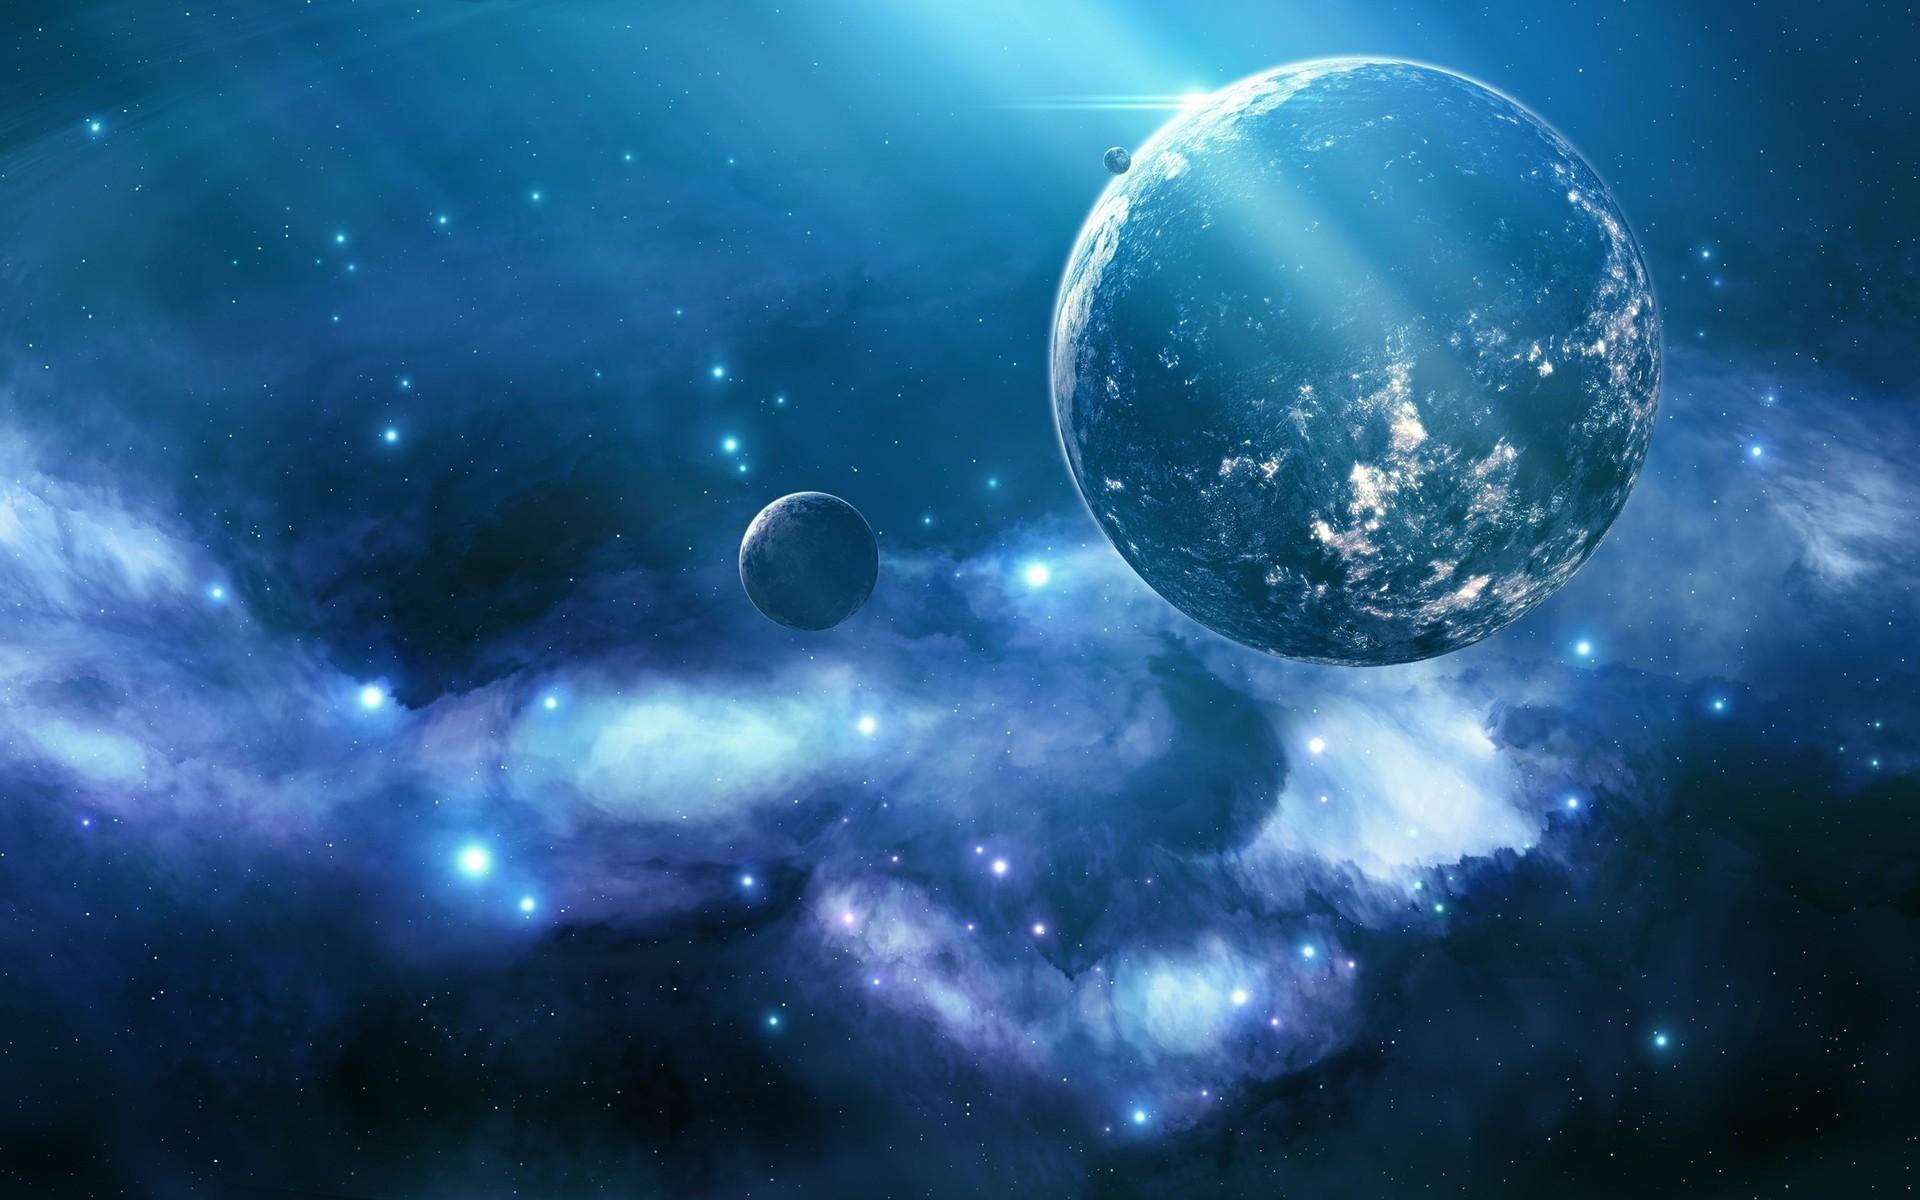 Nebula Wallpapers – Full HD wallpaper search – page 6